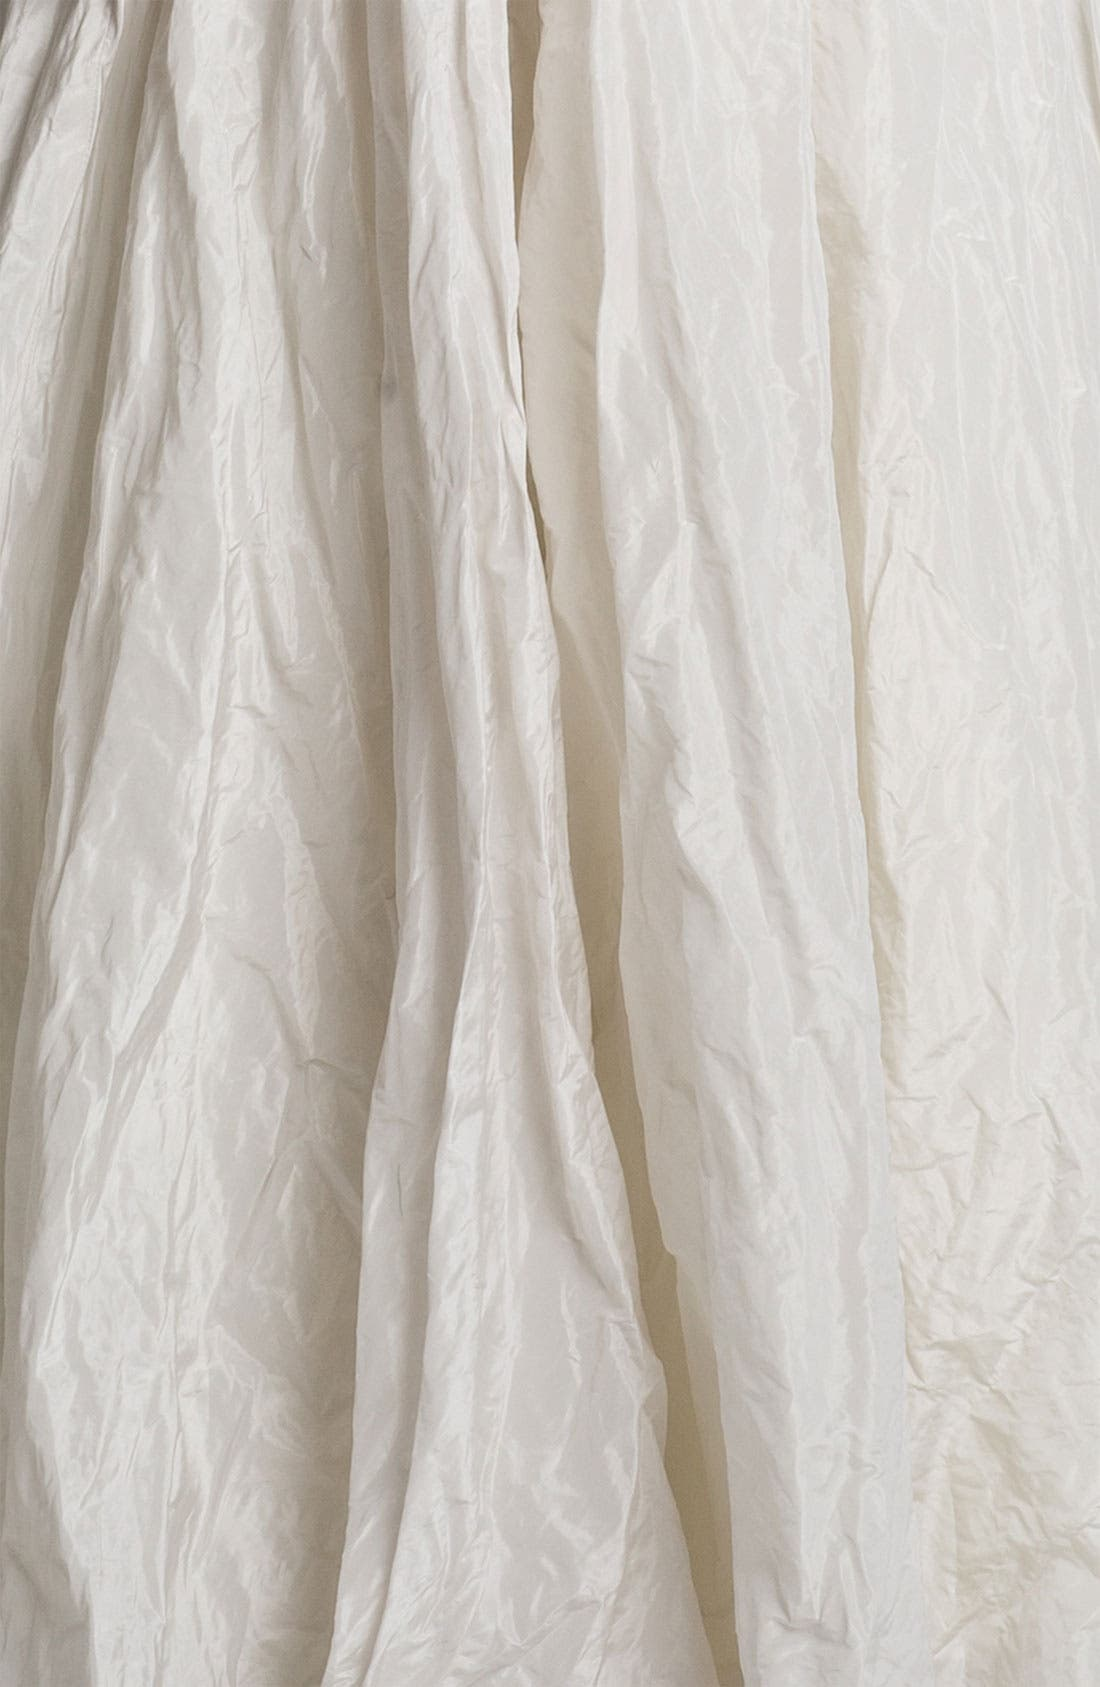 Alternate Image 4  - Nicole Miller 'Stacy' Metallic Textured Taffeta Trumpet Gown